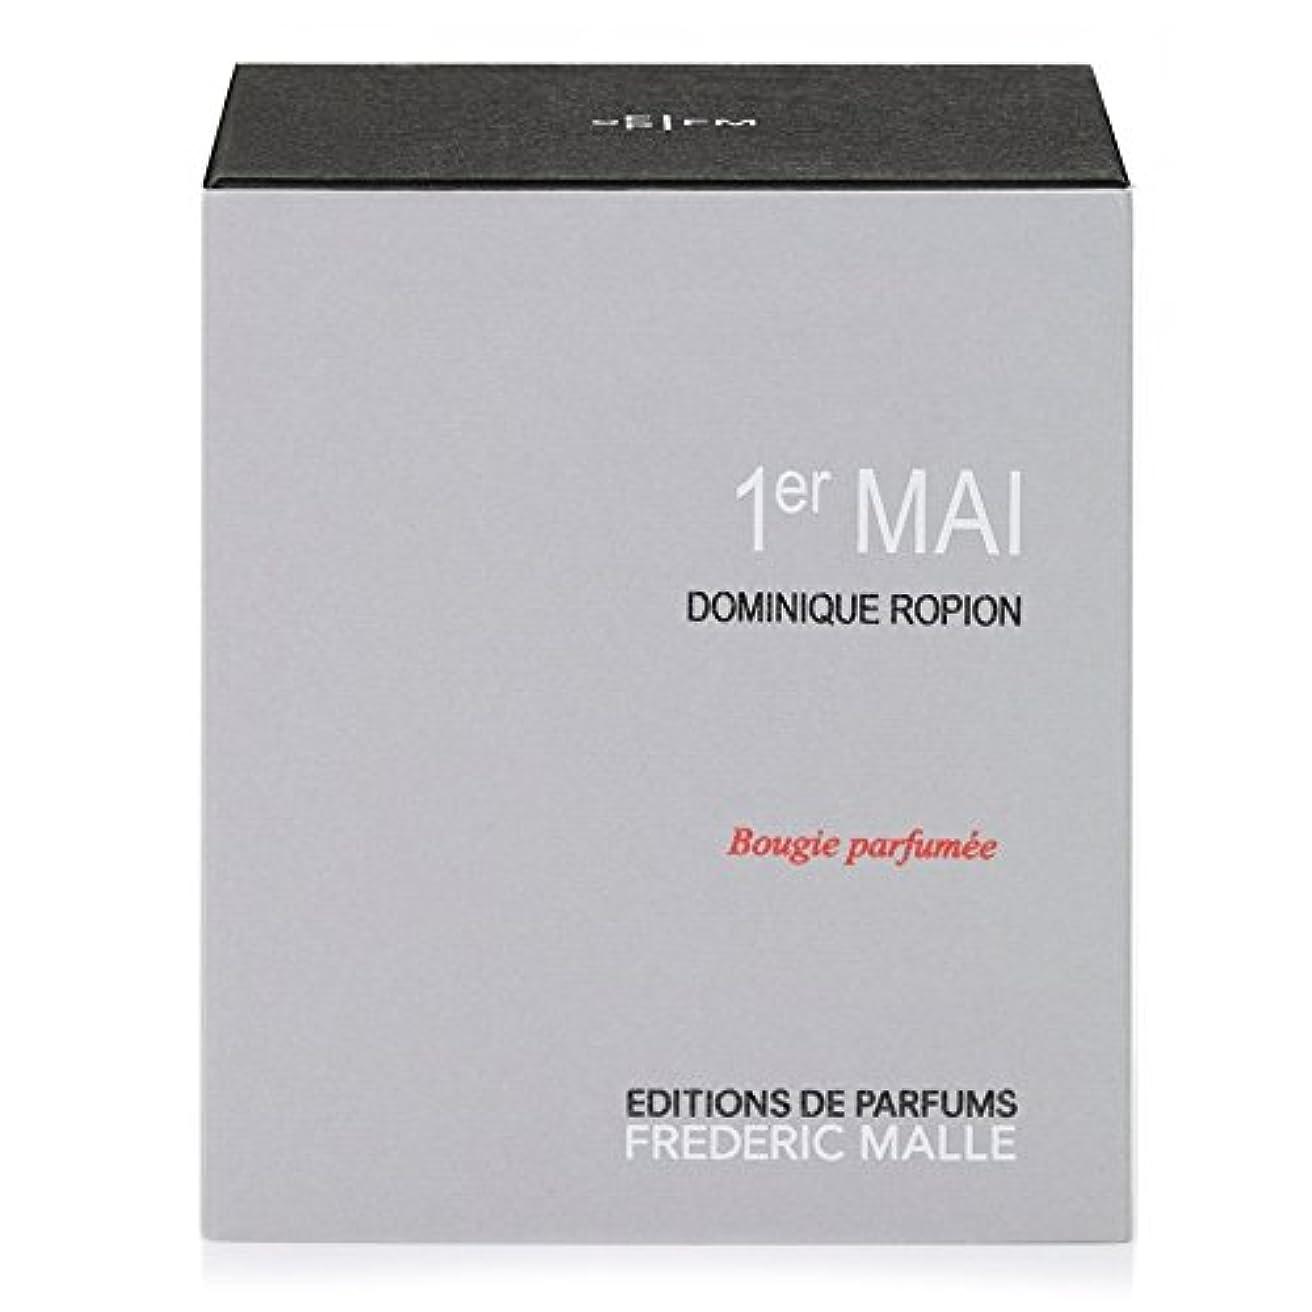 Frederic Malle 1er Mai Scented Candle 220g - フレデリック?マルプルミエ舞香りのキャンドル220グラム [並行輸入品]